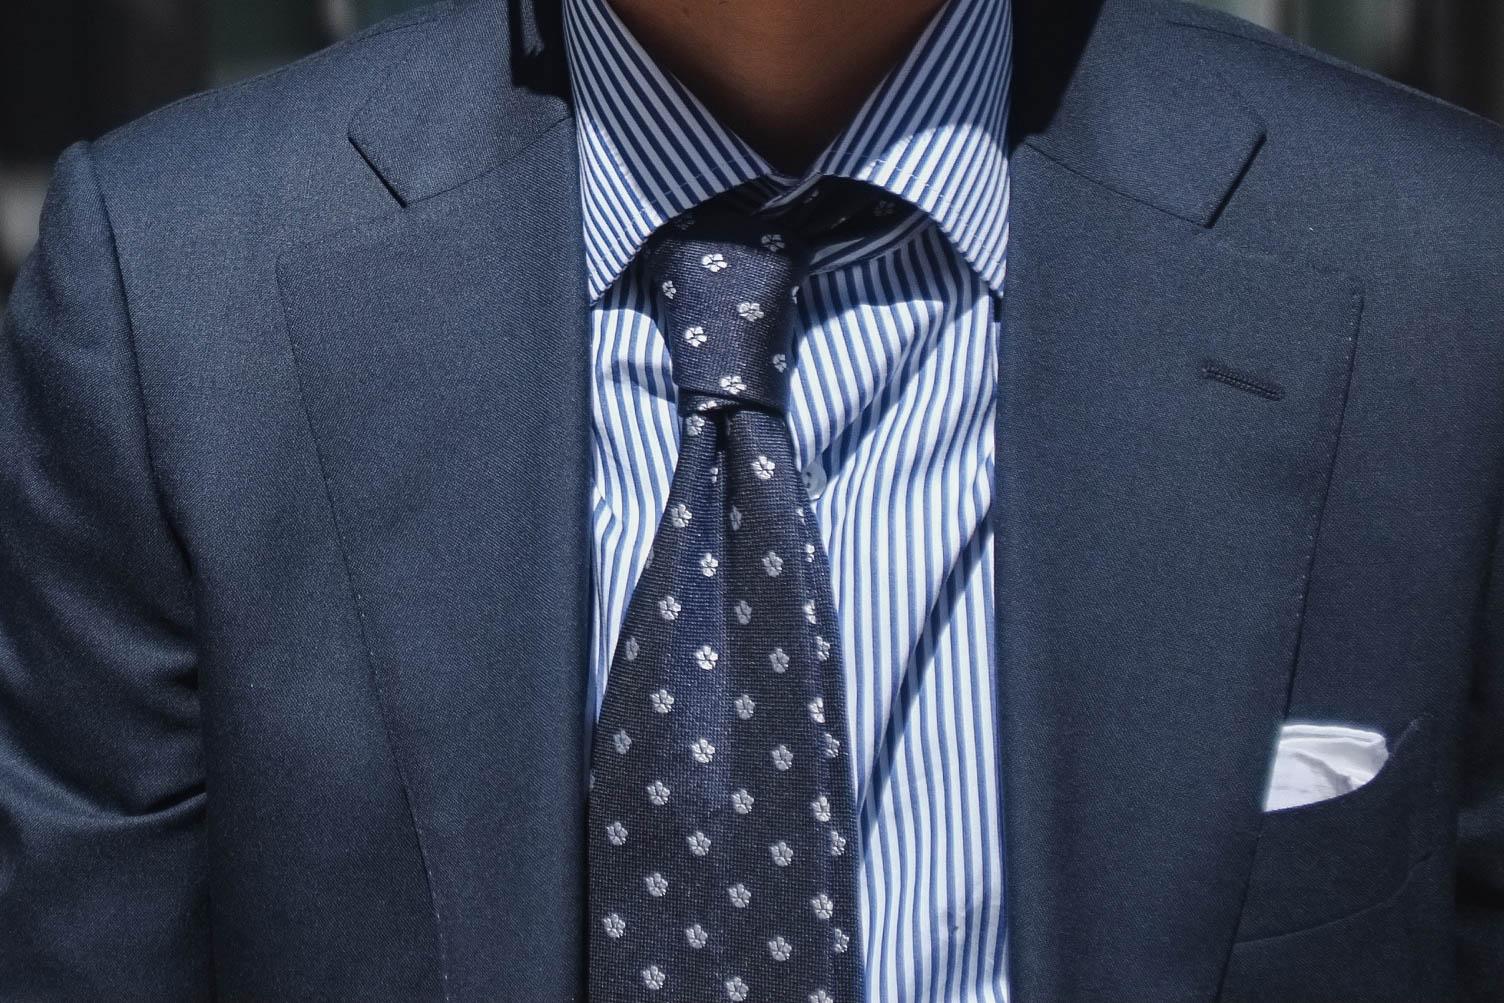 Glasses -   JINS   Suit - SuitSupply   Shirt - Proper Cloth   Tie - Vanda Fine Clothing   Pocket Square - Drake's of London   Belt and Shoes - Carmina Shoe Maker   Briefcase - Filson